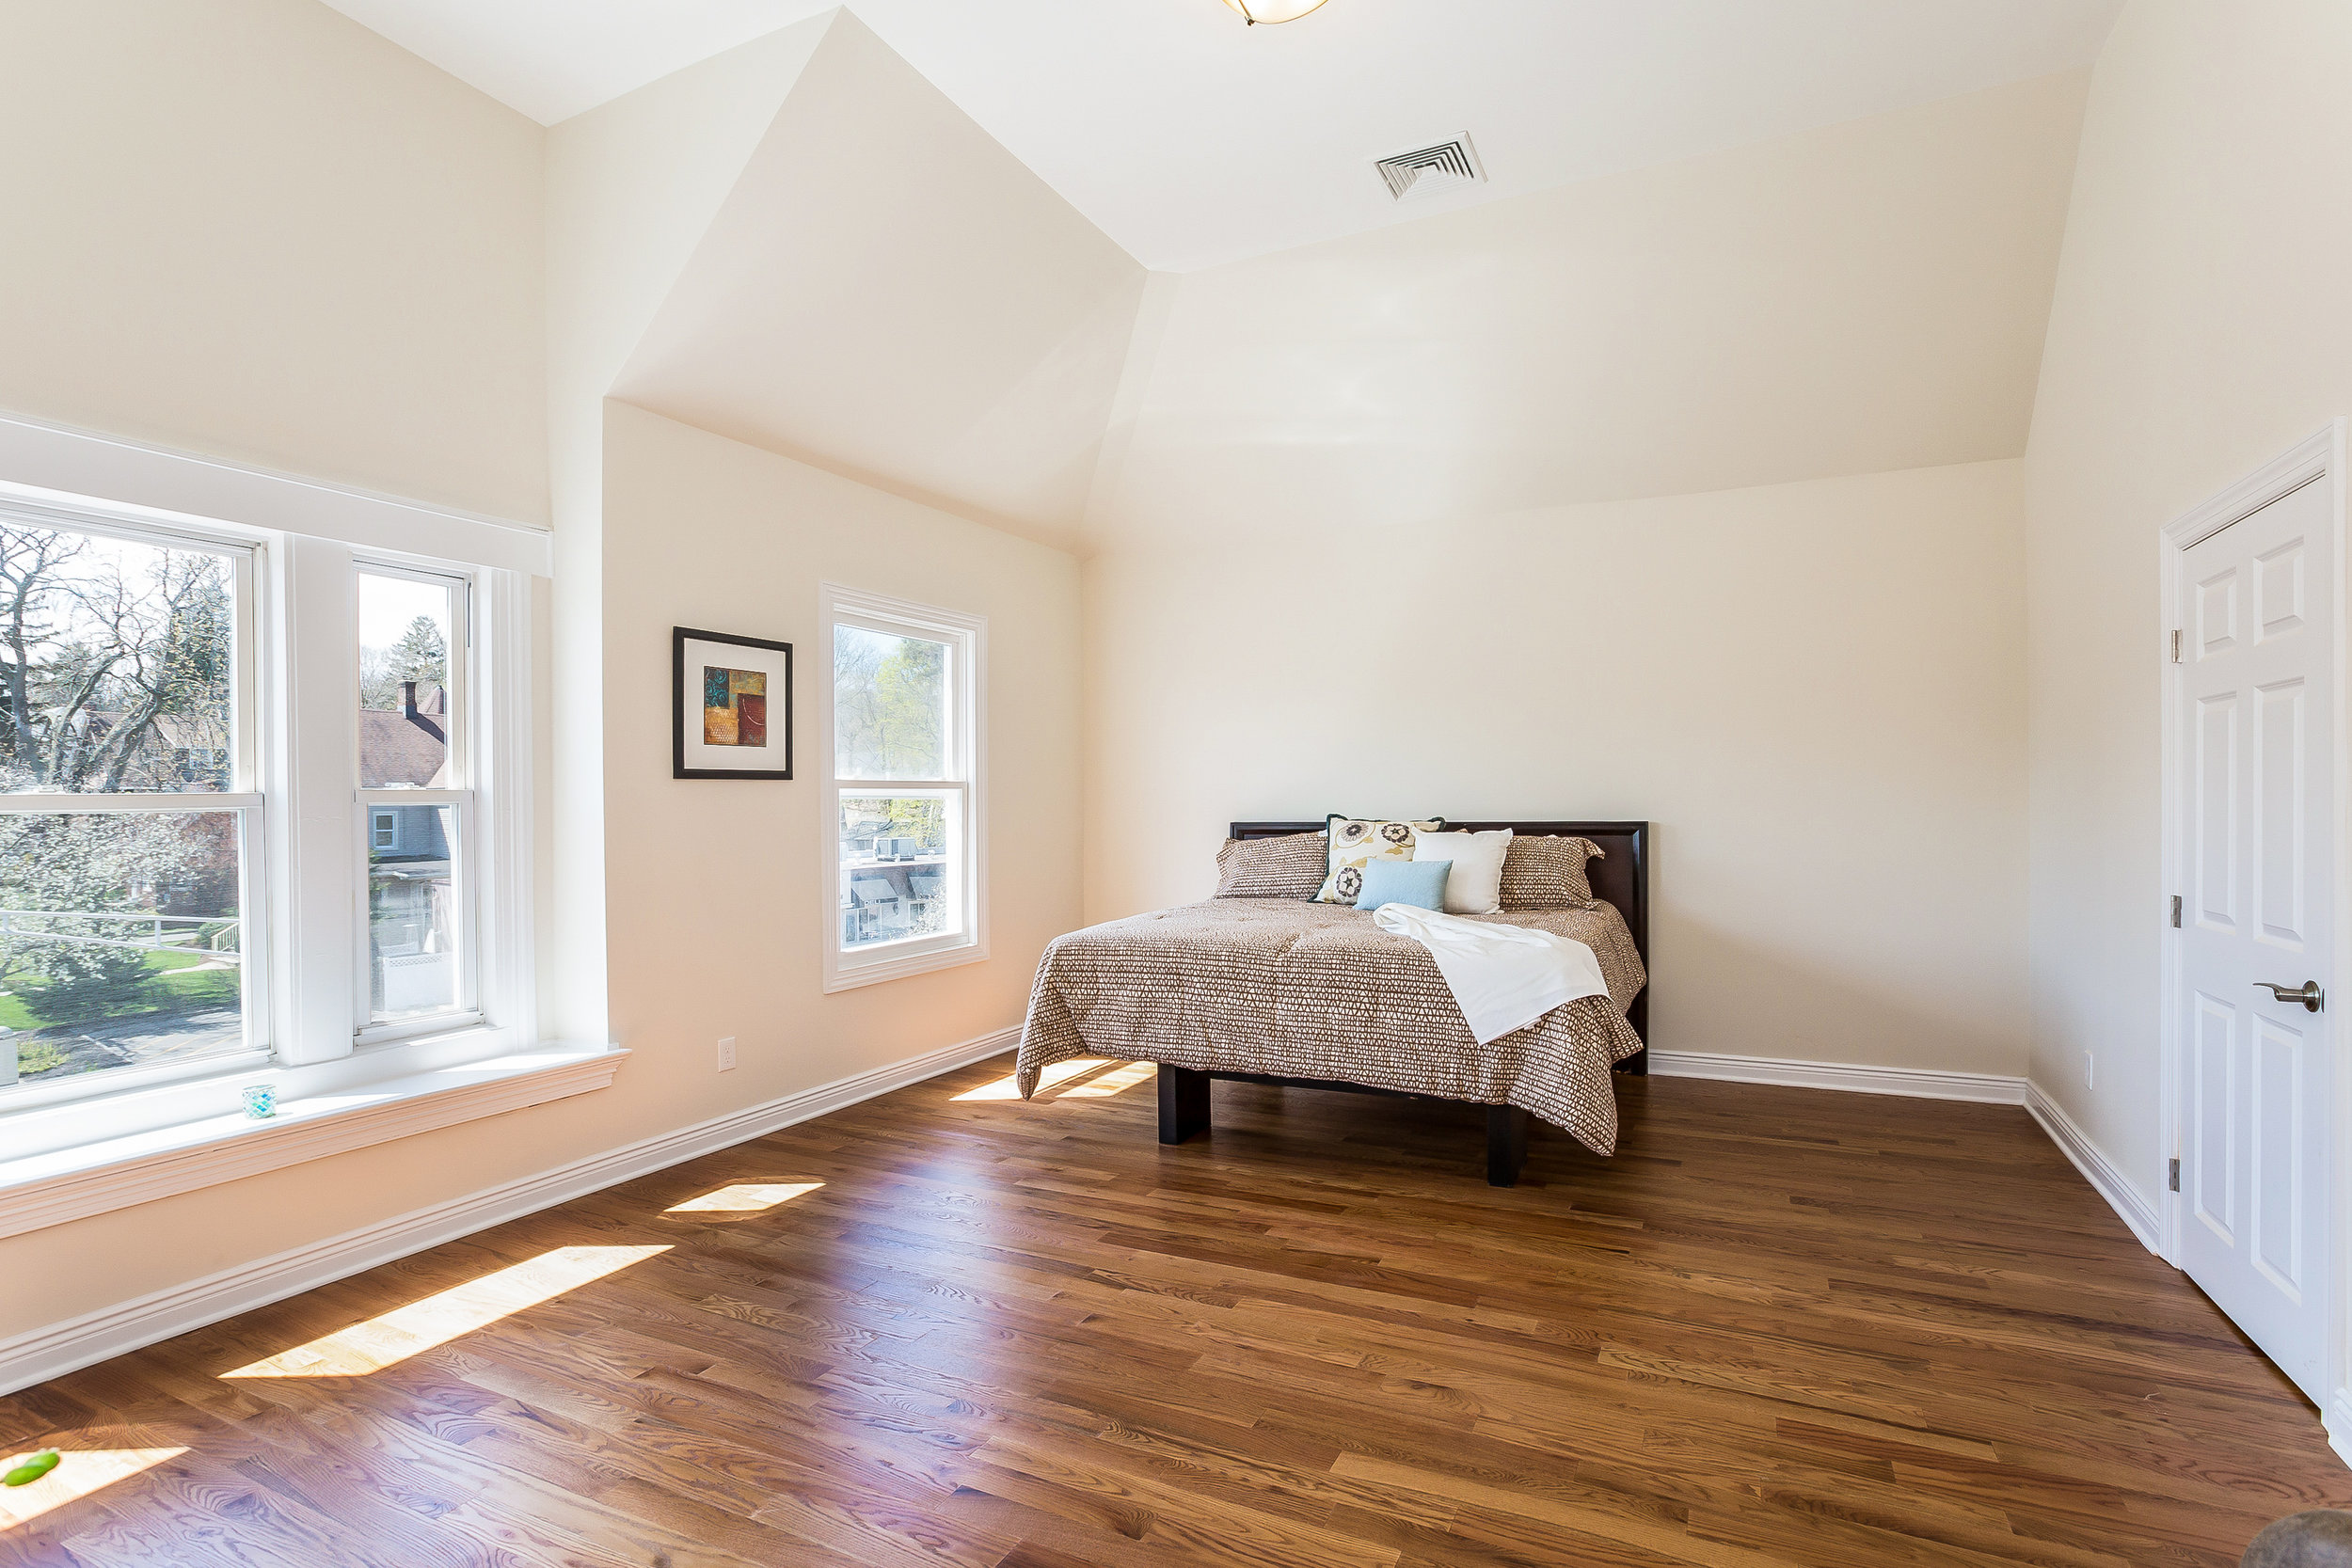 043-Master_Bedroom-3992661-large.jpg